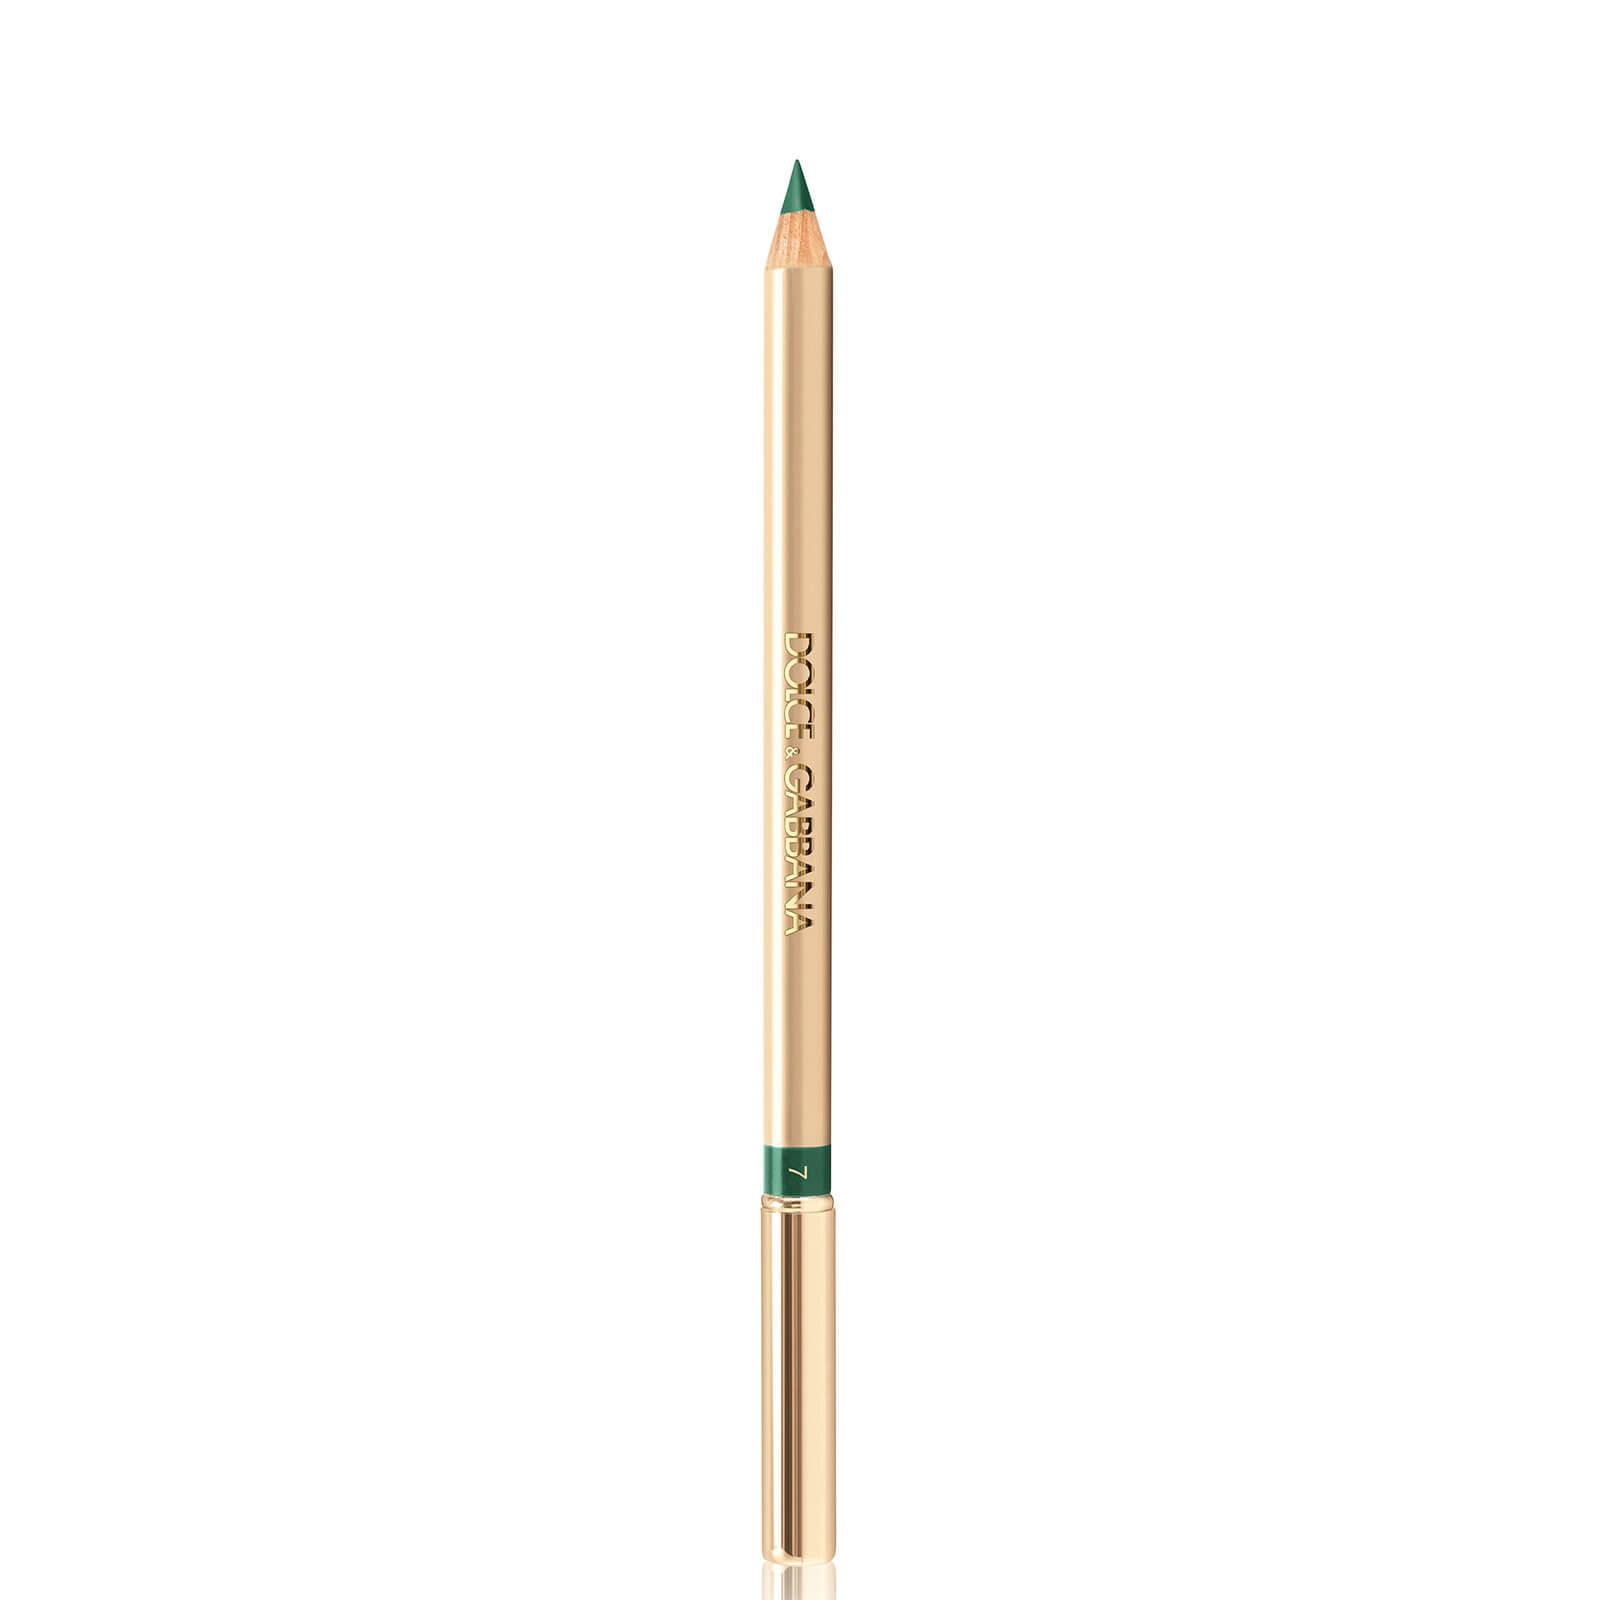 Купить Dolce&Gabbana Eyeliner Pencil 1.55g (Various Shades) - 7 Emerald